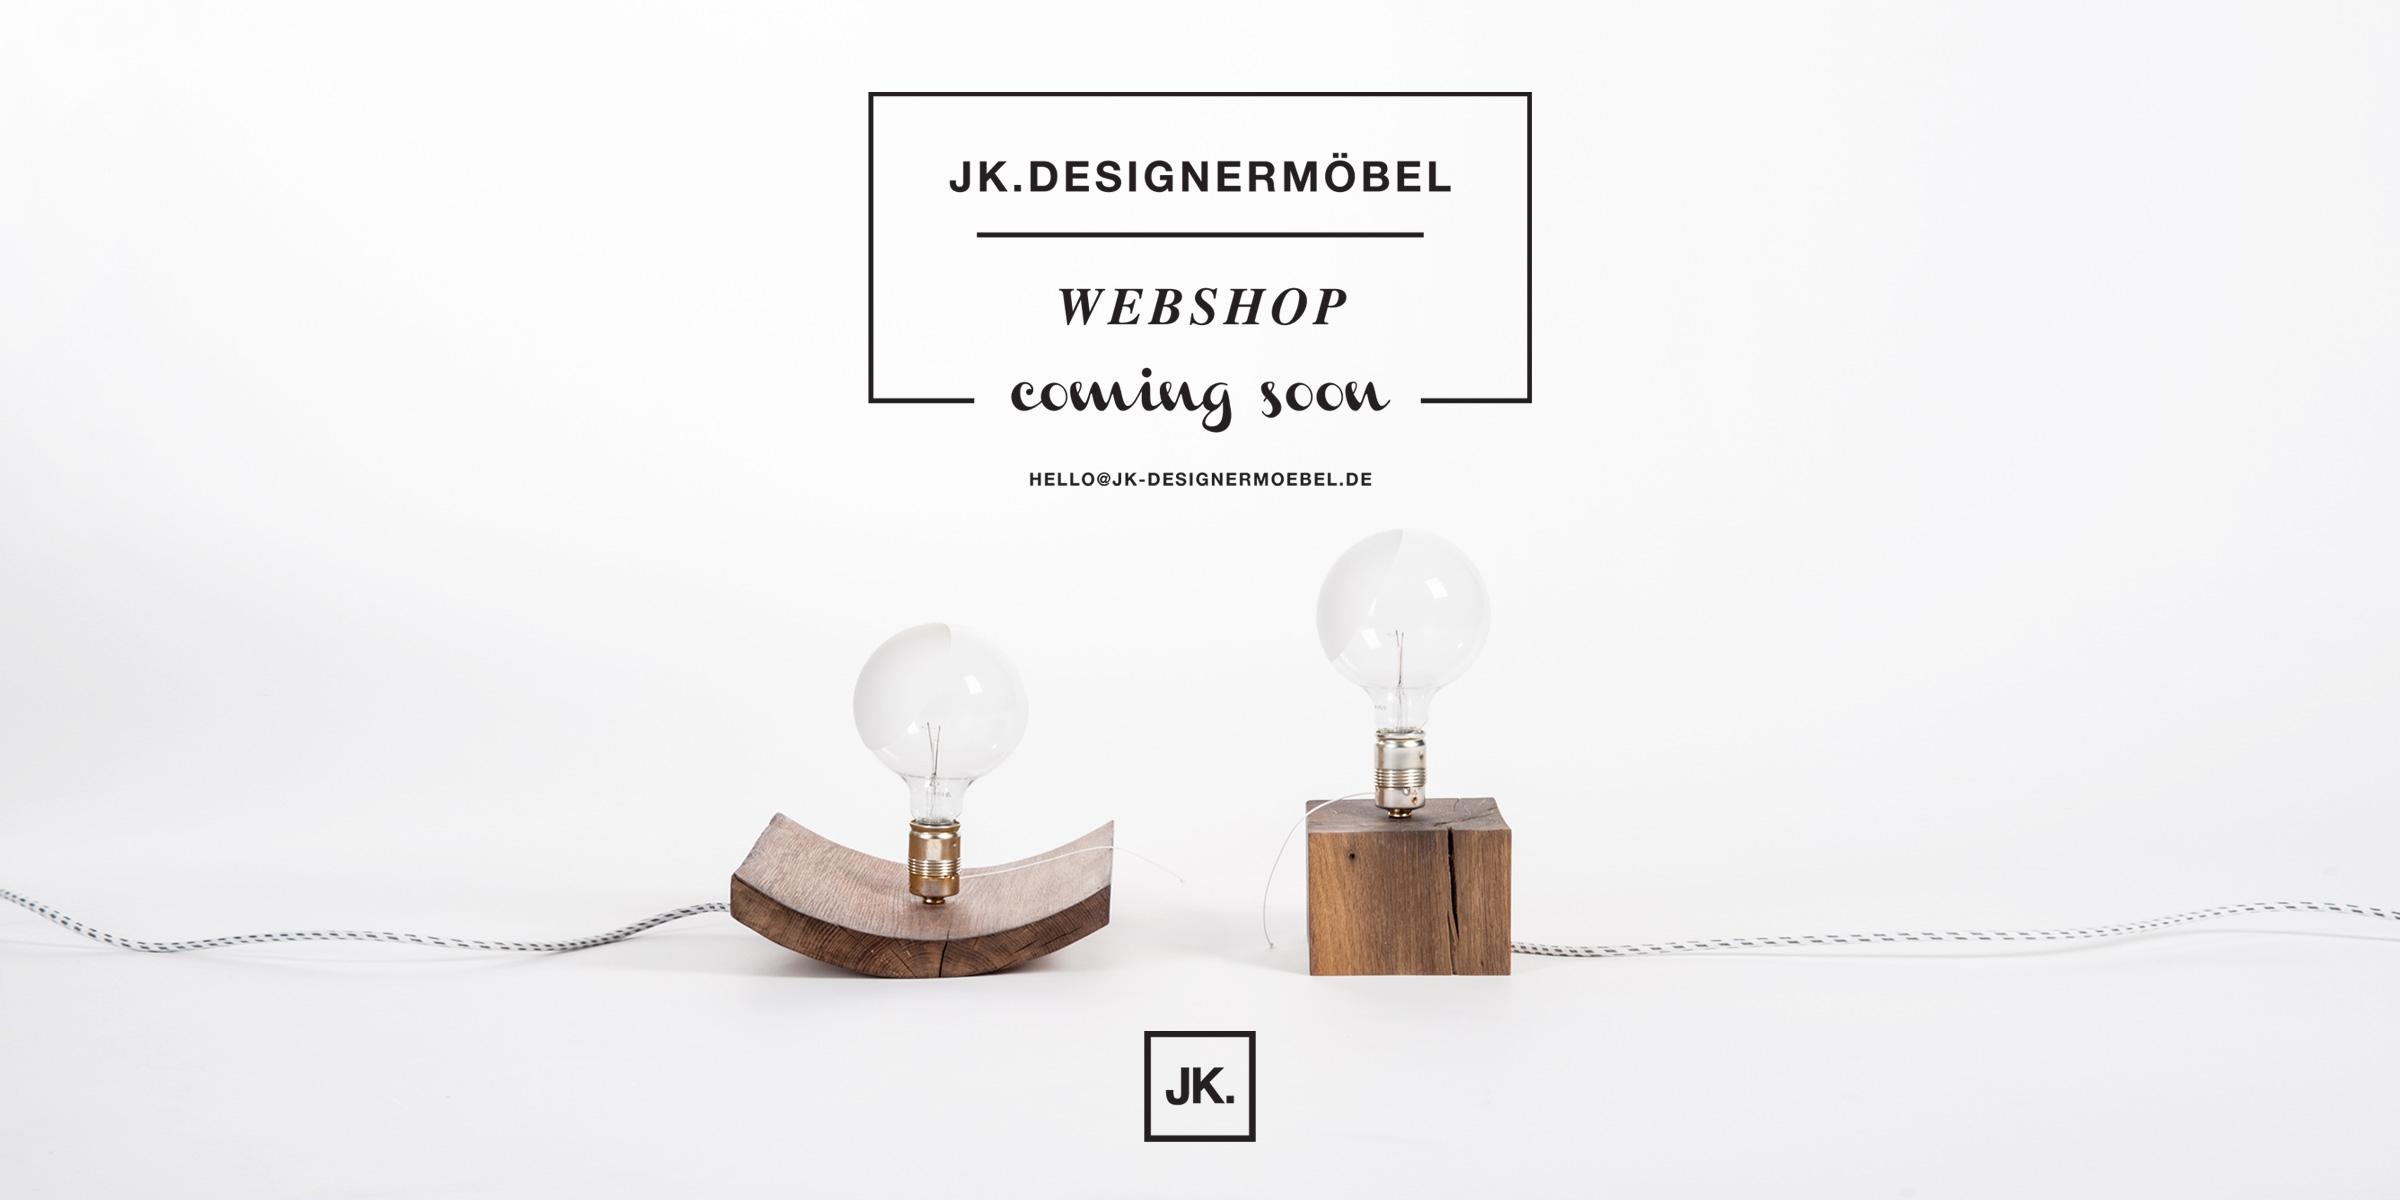 JK.Designermöbel Webshop coming soon